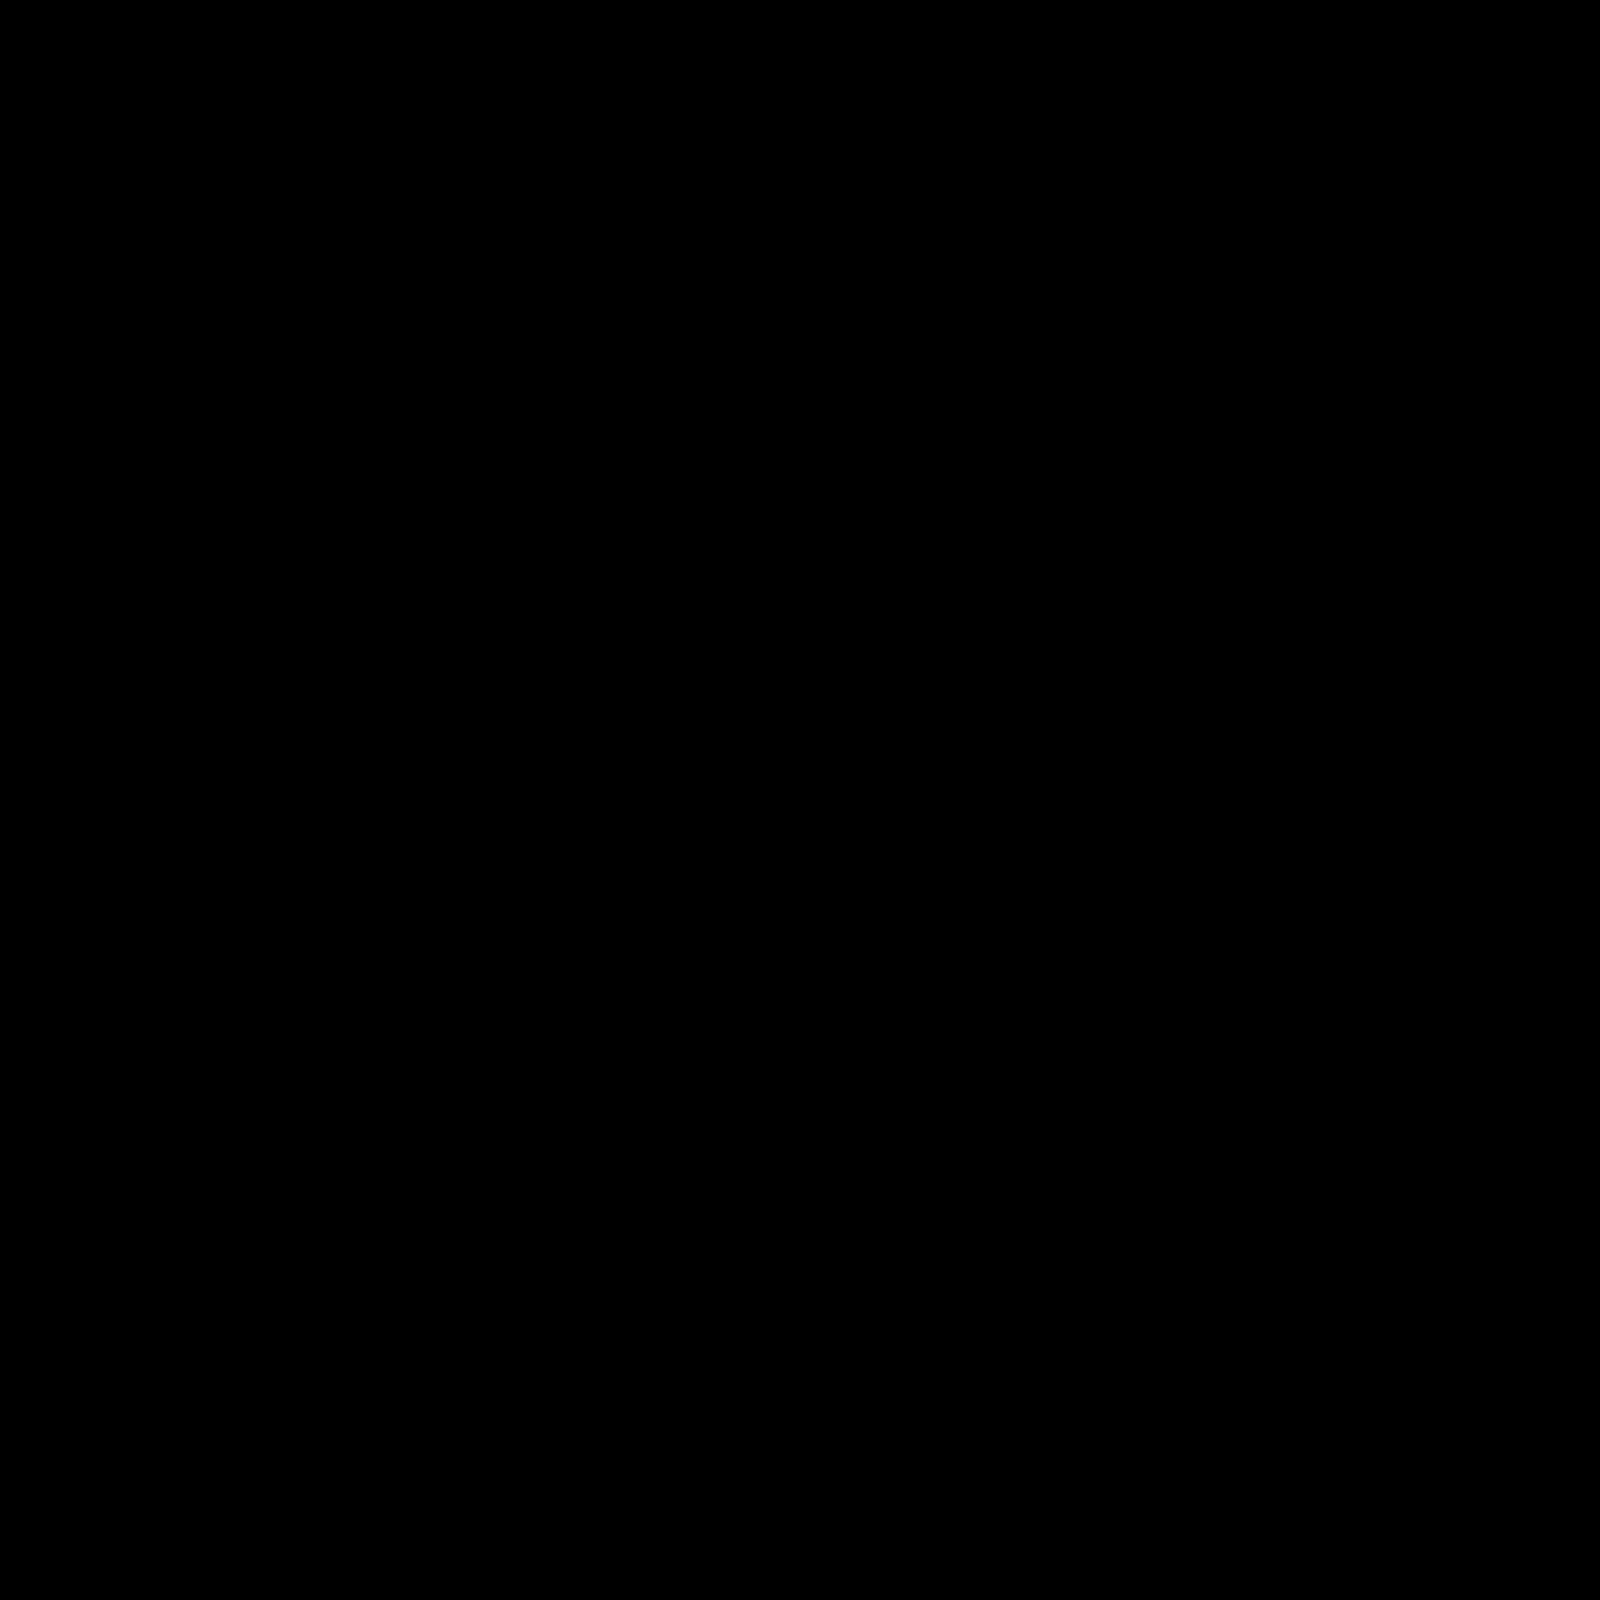 Darth Vader Filled icon